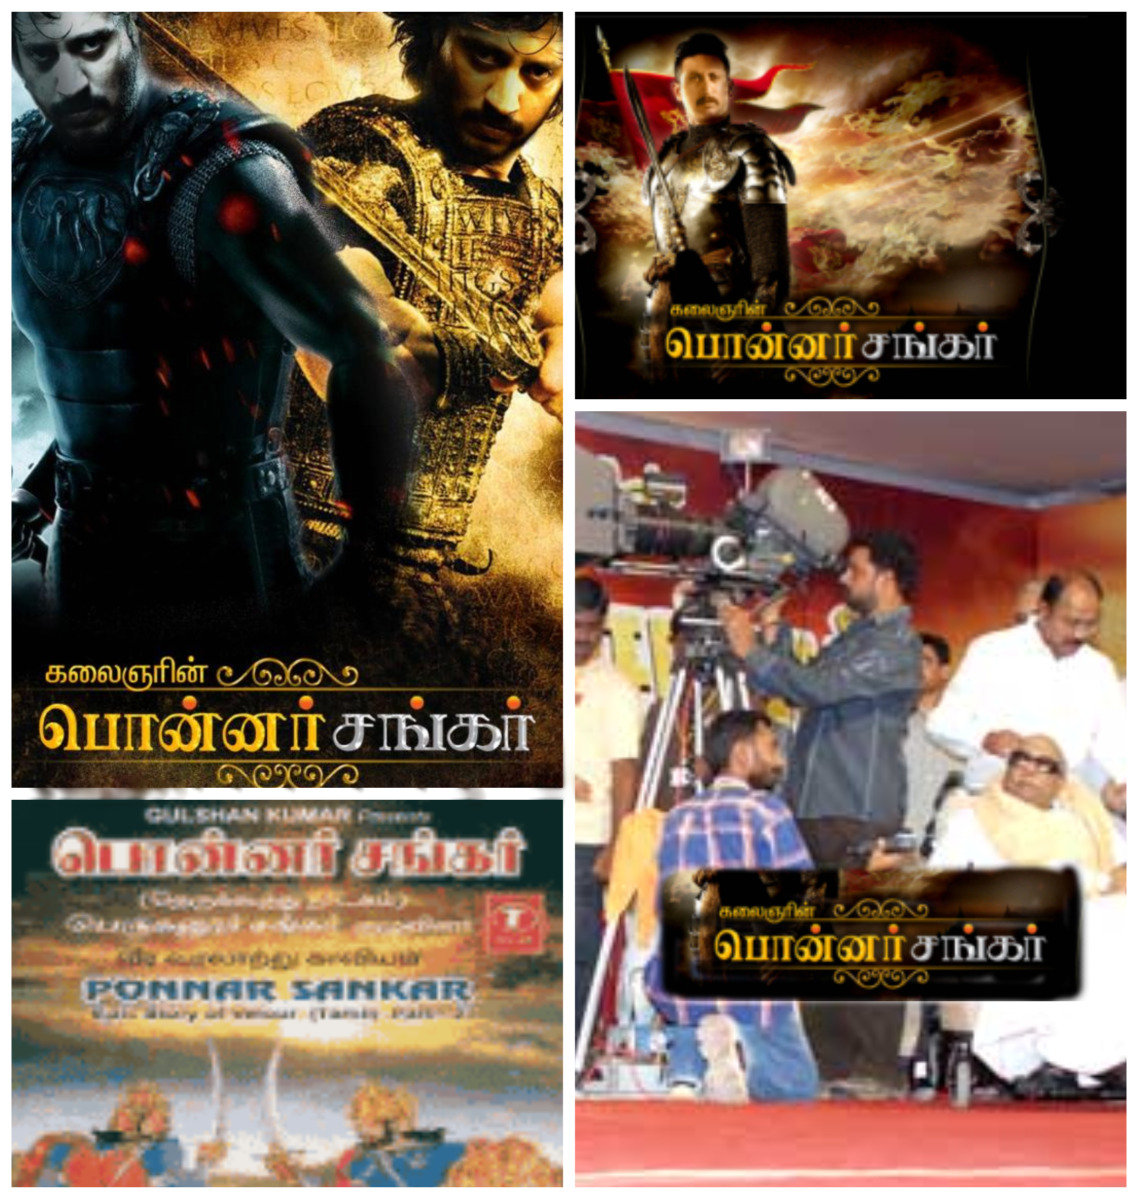 Ponnar Shankar Movie Release Date 39 Ponnar Shankar 39 Movie is